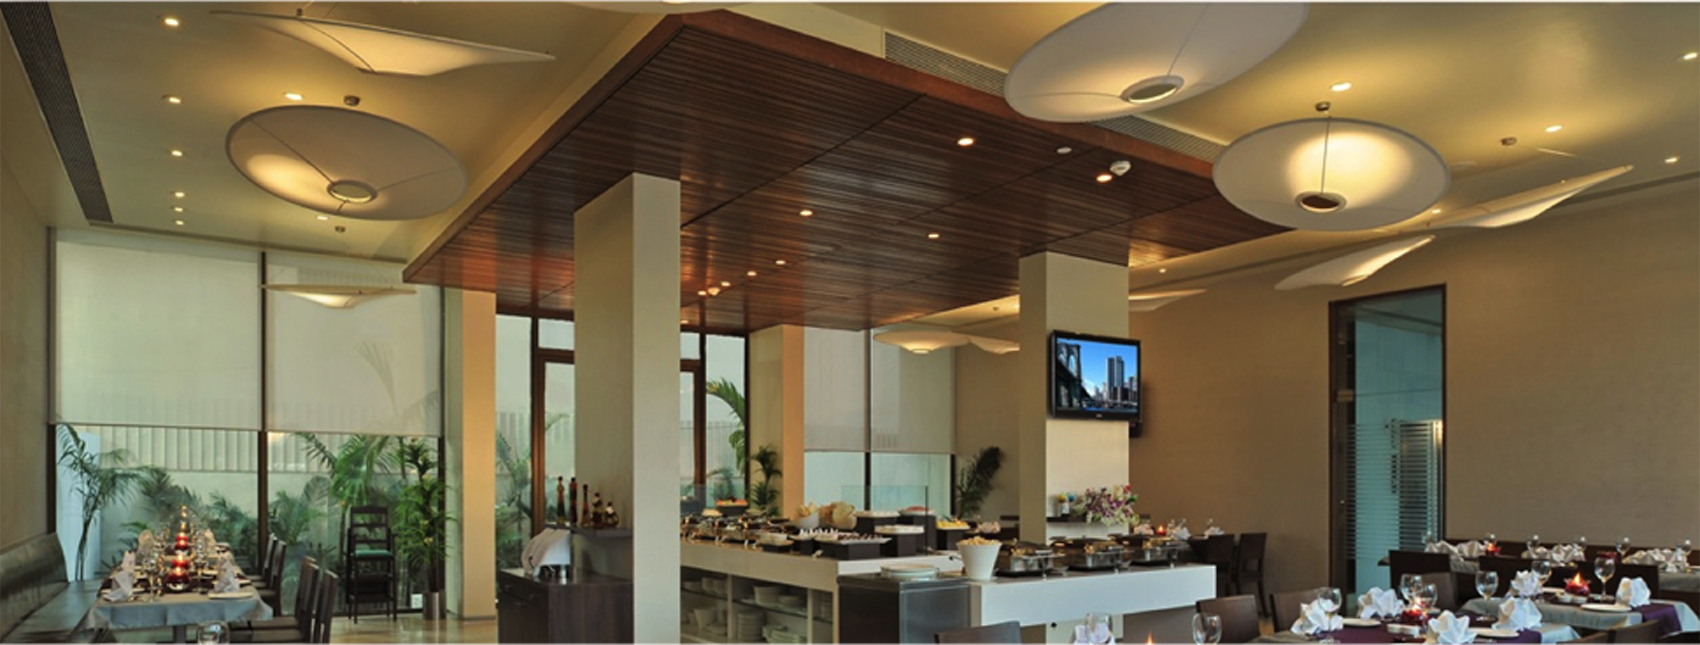 Business Hotel Restaurant